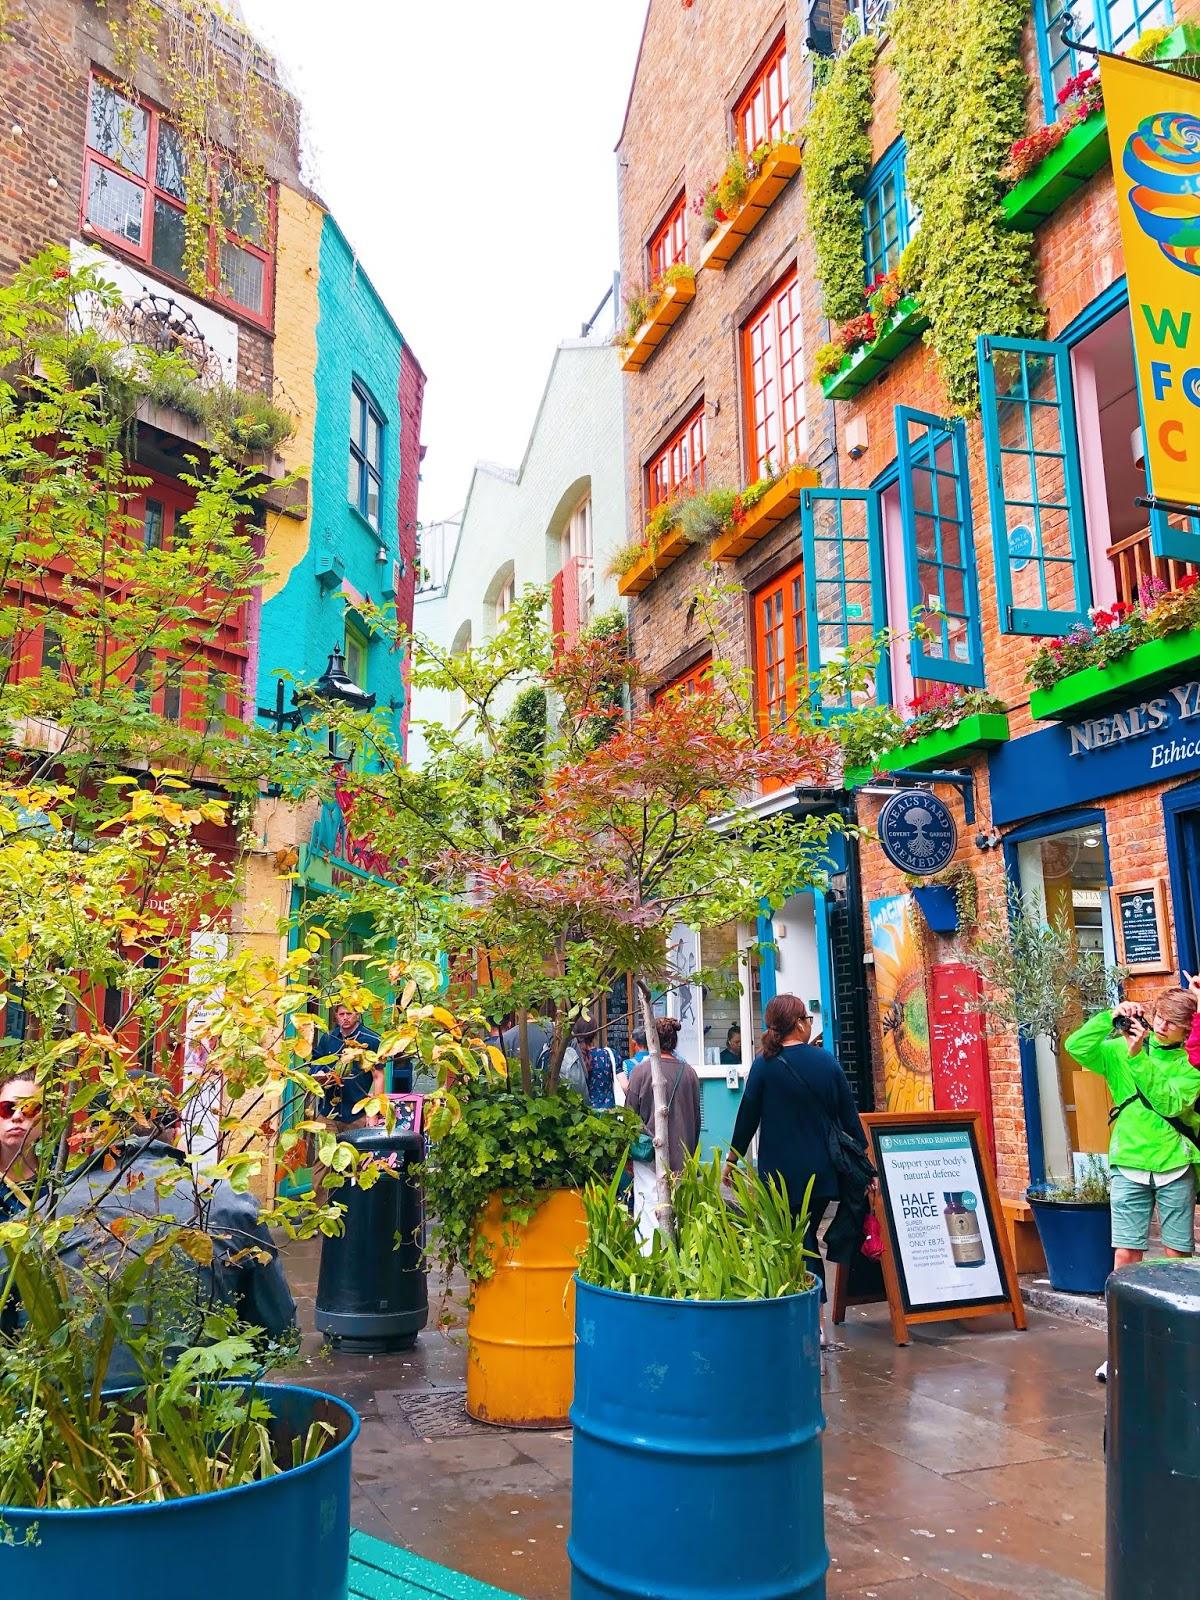 Londres:  Mi diario de viaje